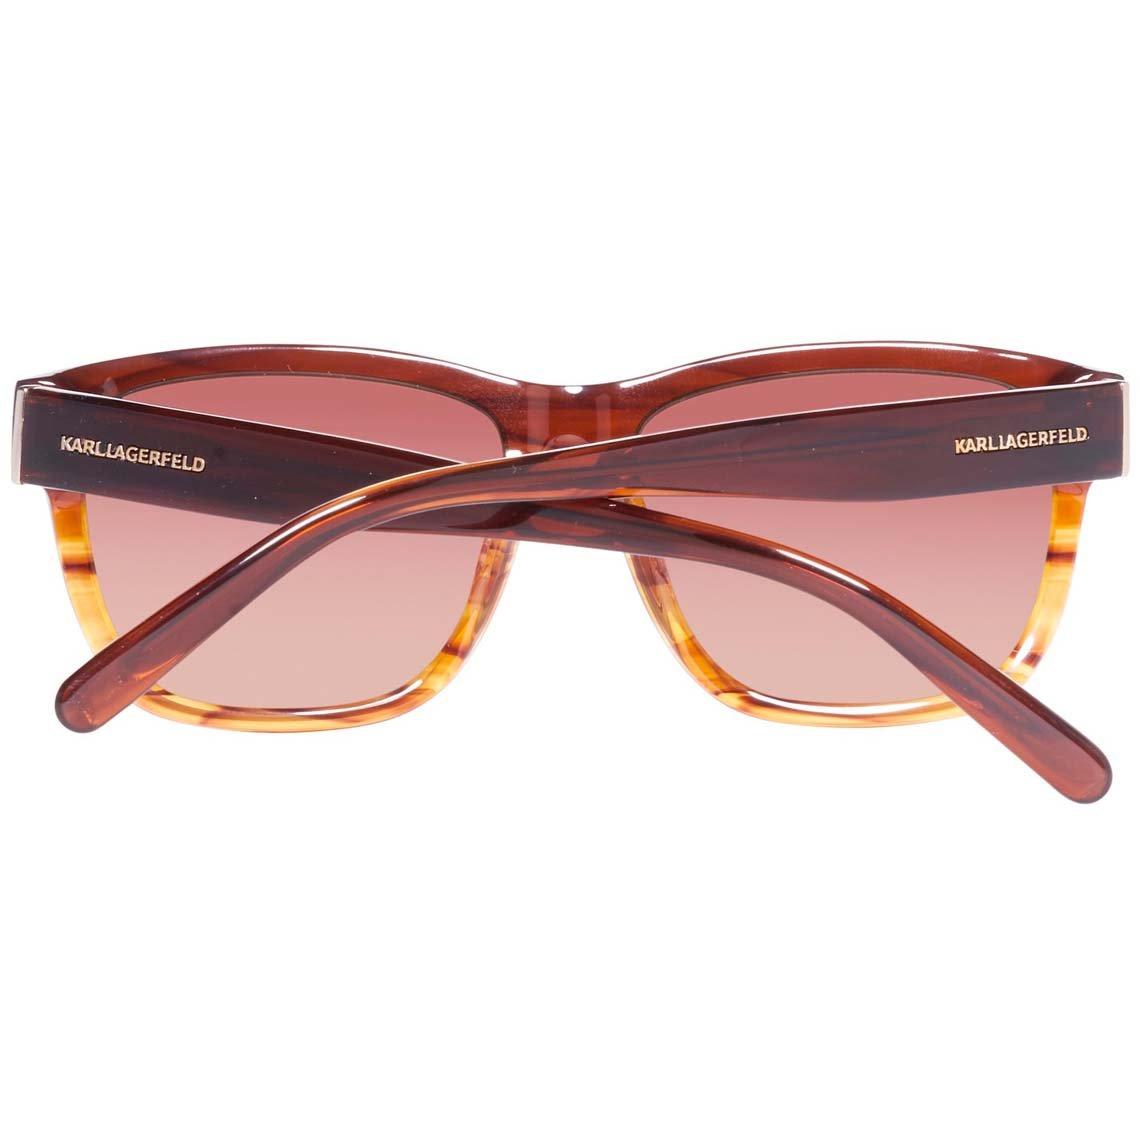 Karl Lagerfeld Gafas de Sol KL 810/S 044 PVP 220, 00 Euro ...